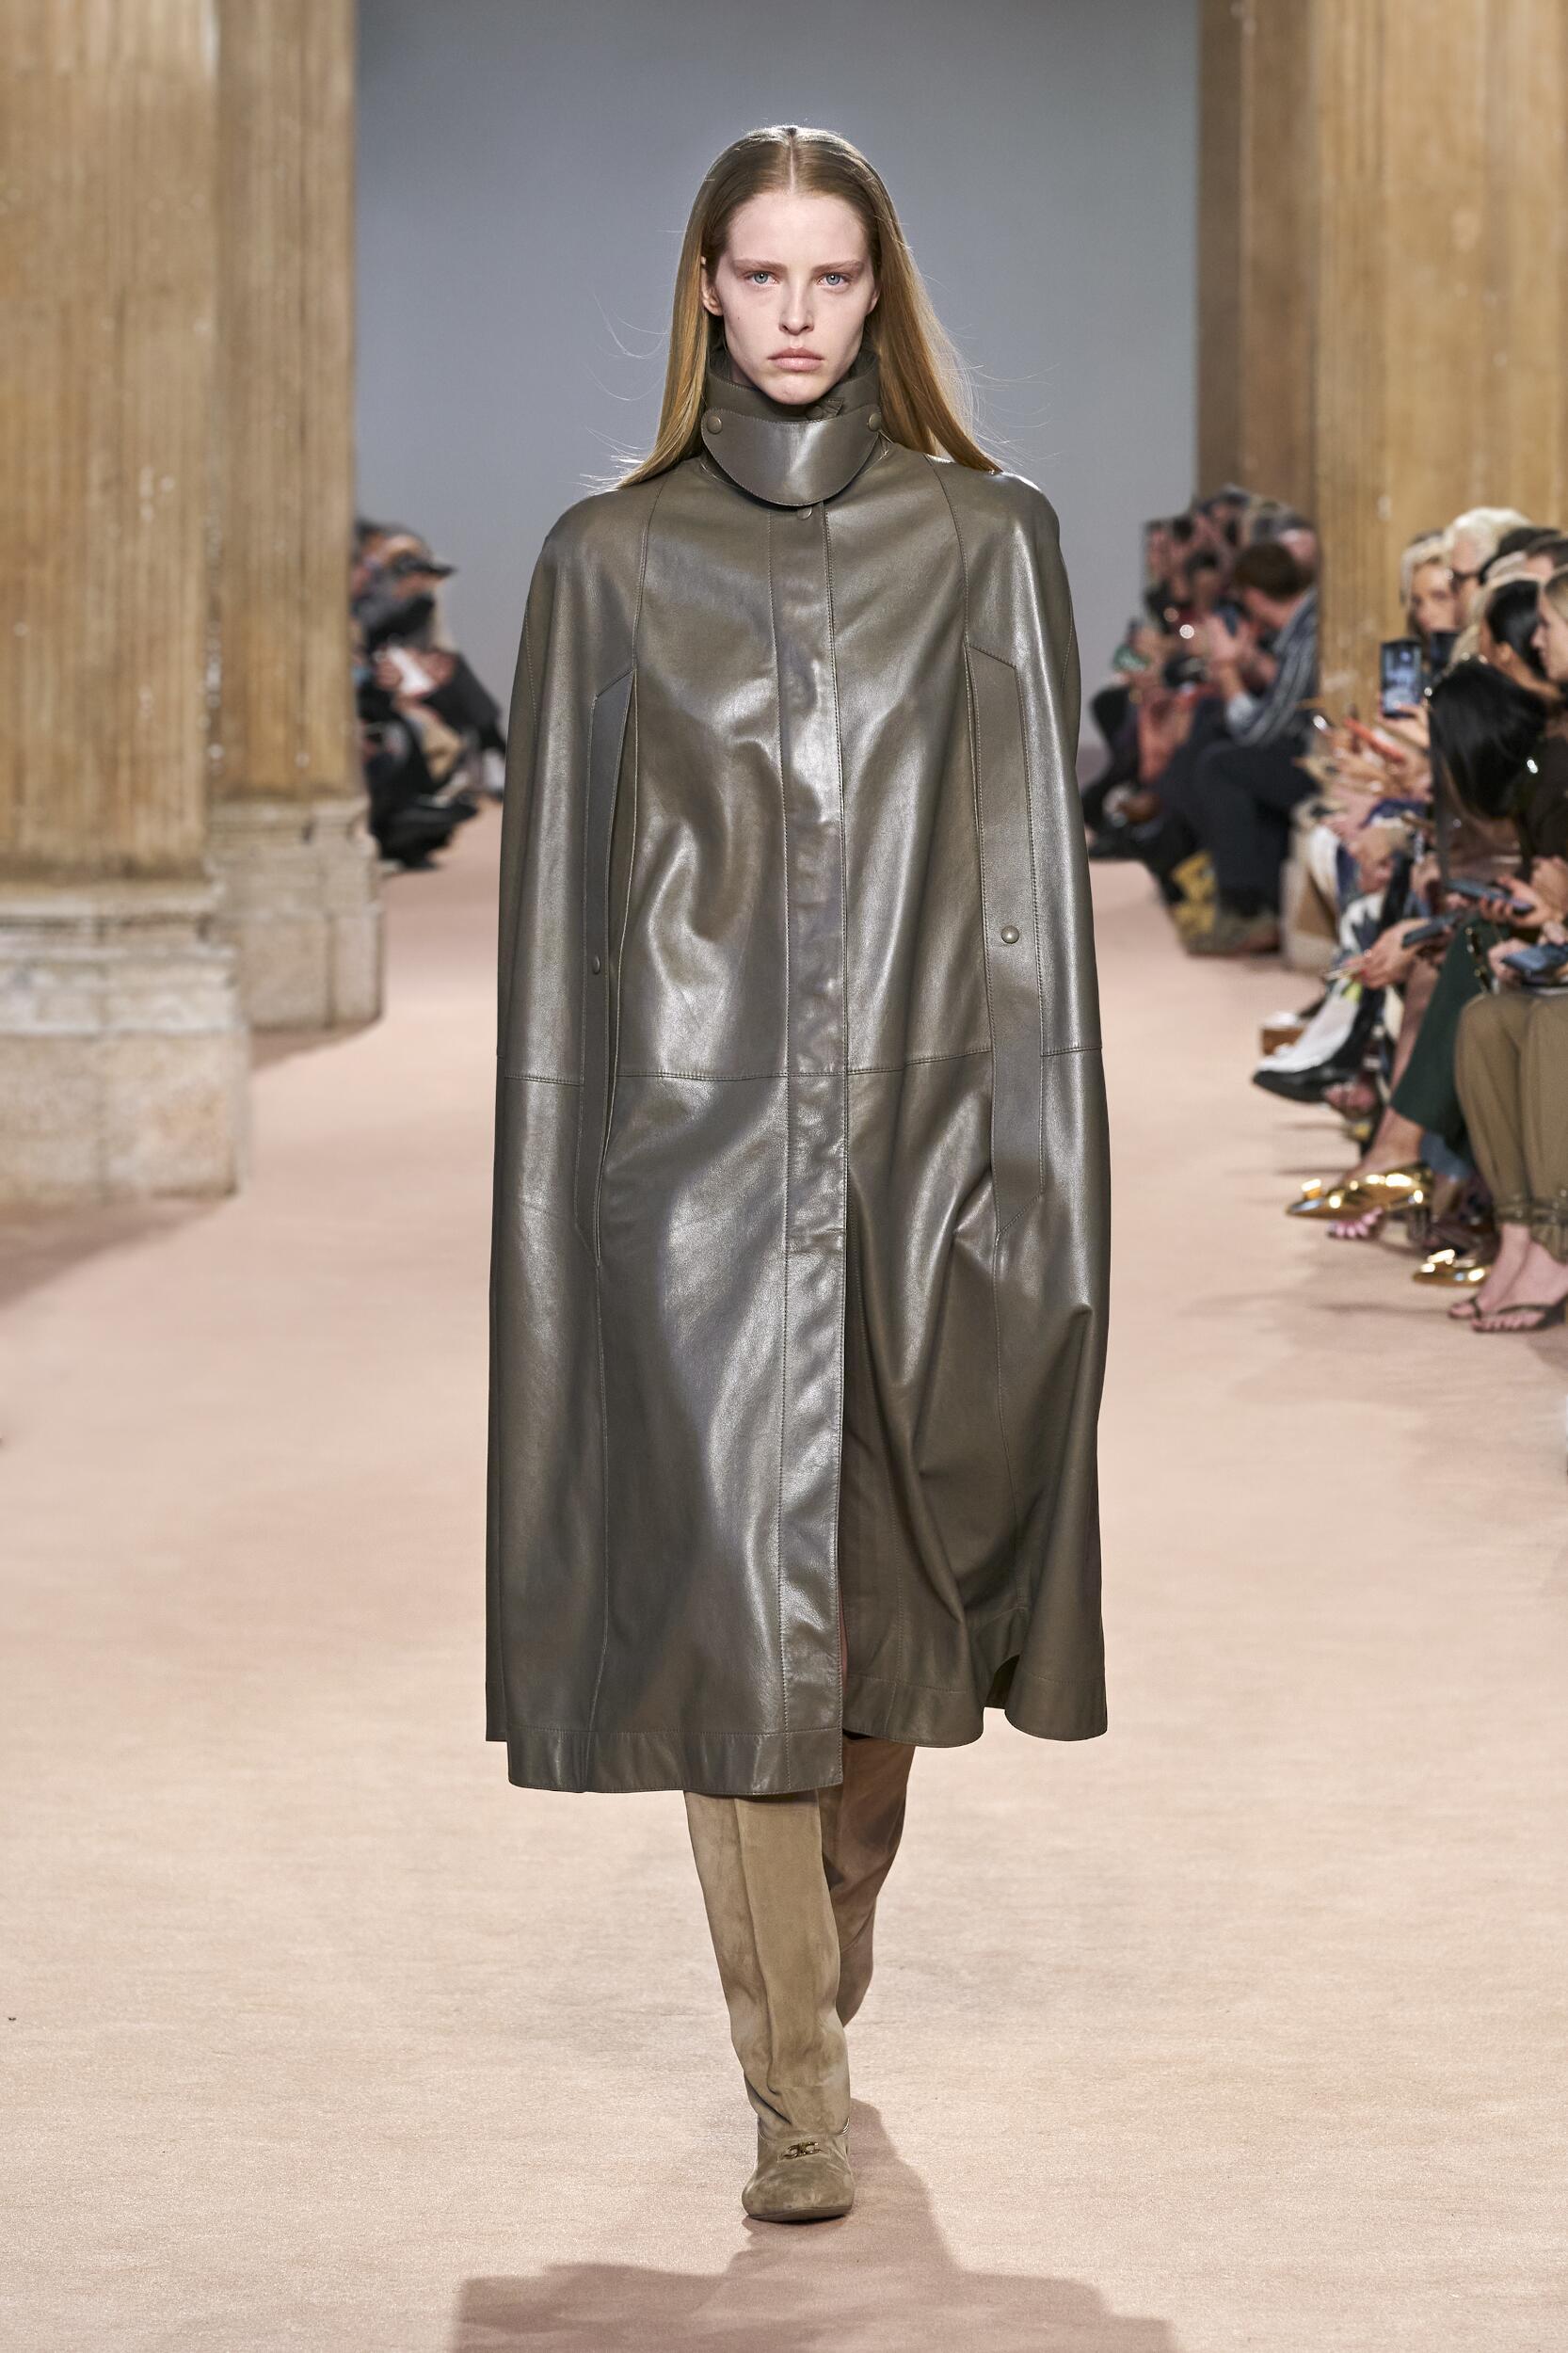 Runway Salvatore Ferragamo Fall Winter 2020 Women's Collection Milan Fashion Week